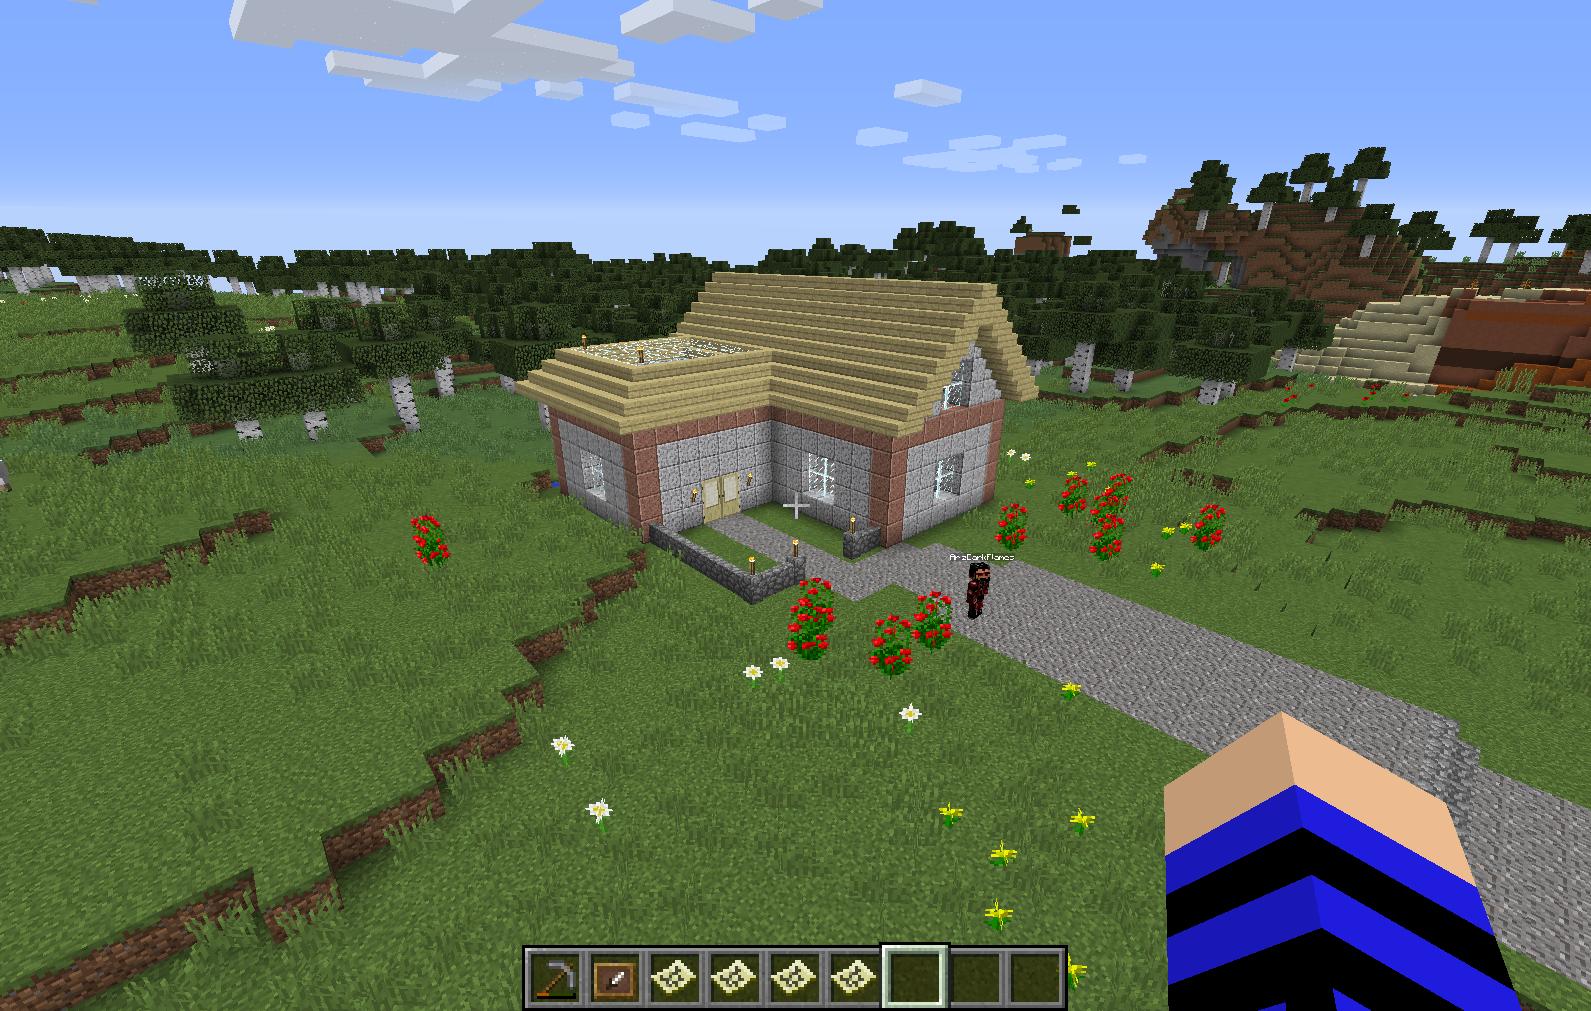 12.12.12.12:12 : LizC12 Minecraft: My 12rd build: L-Shaped